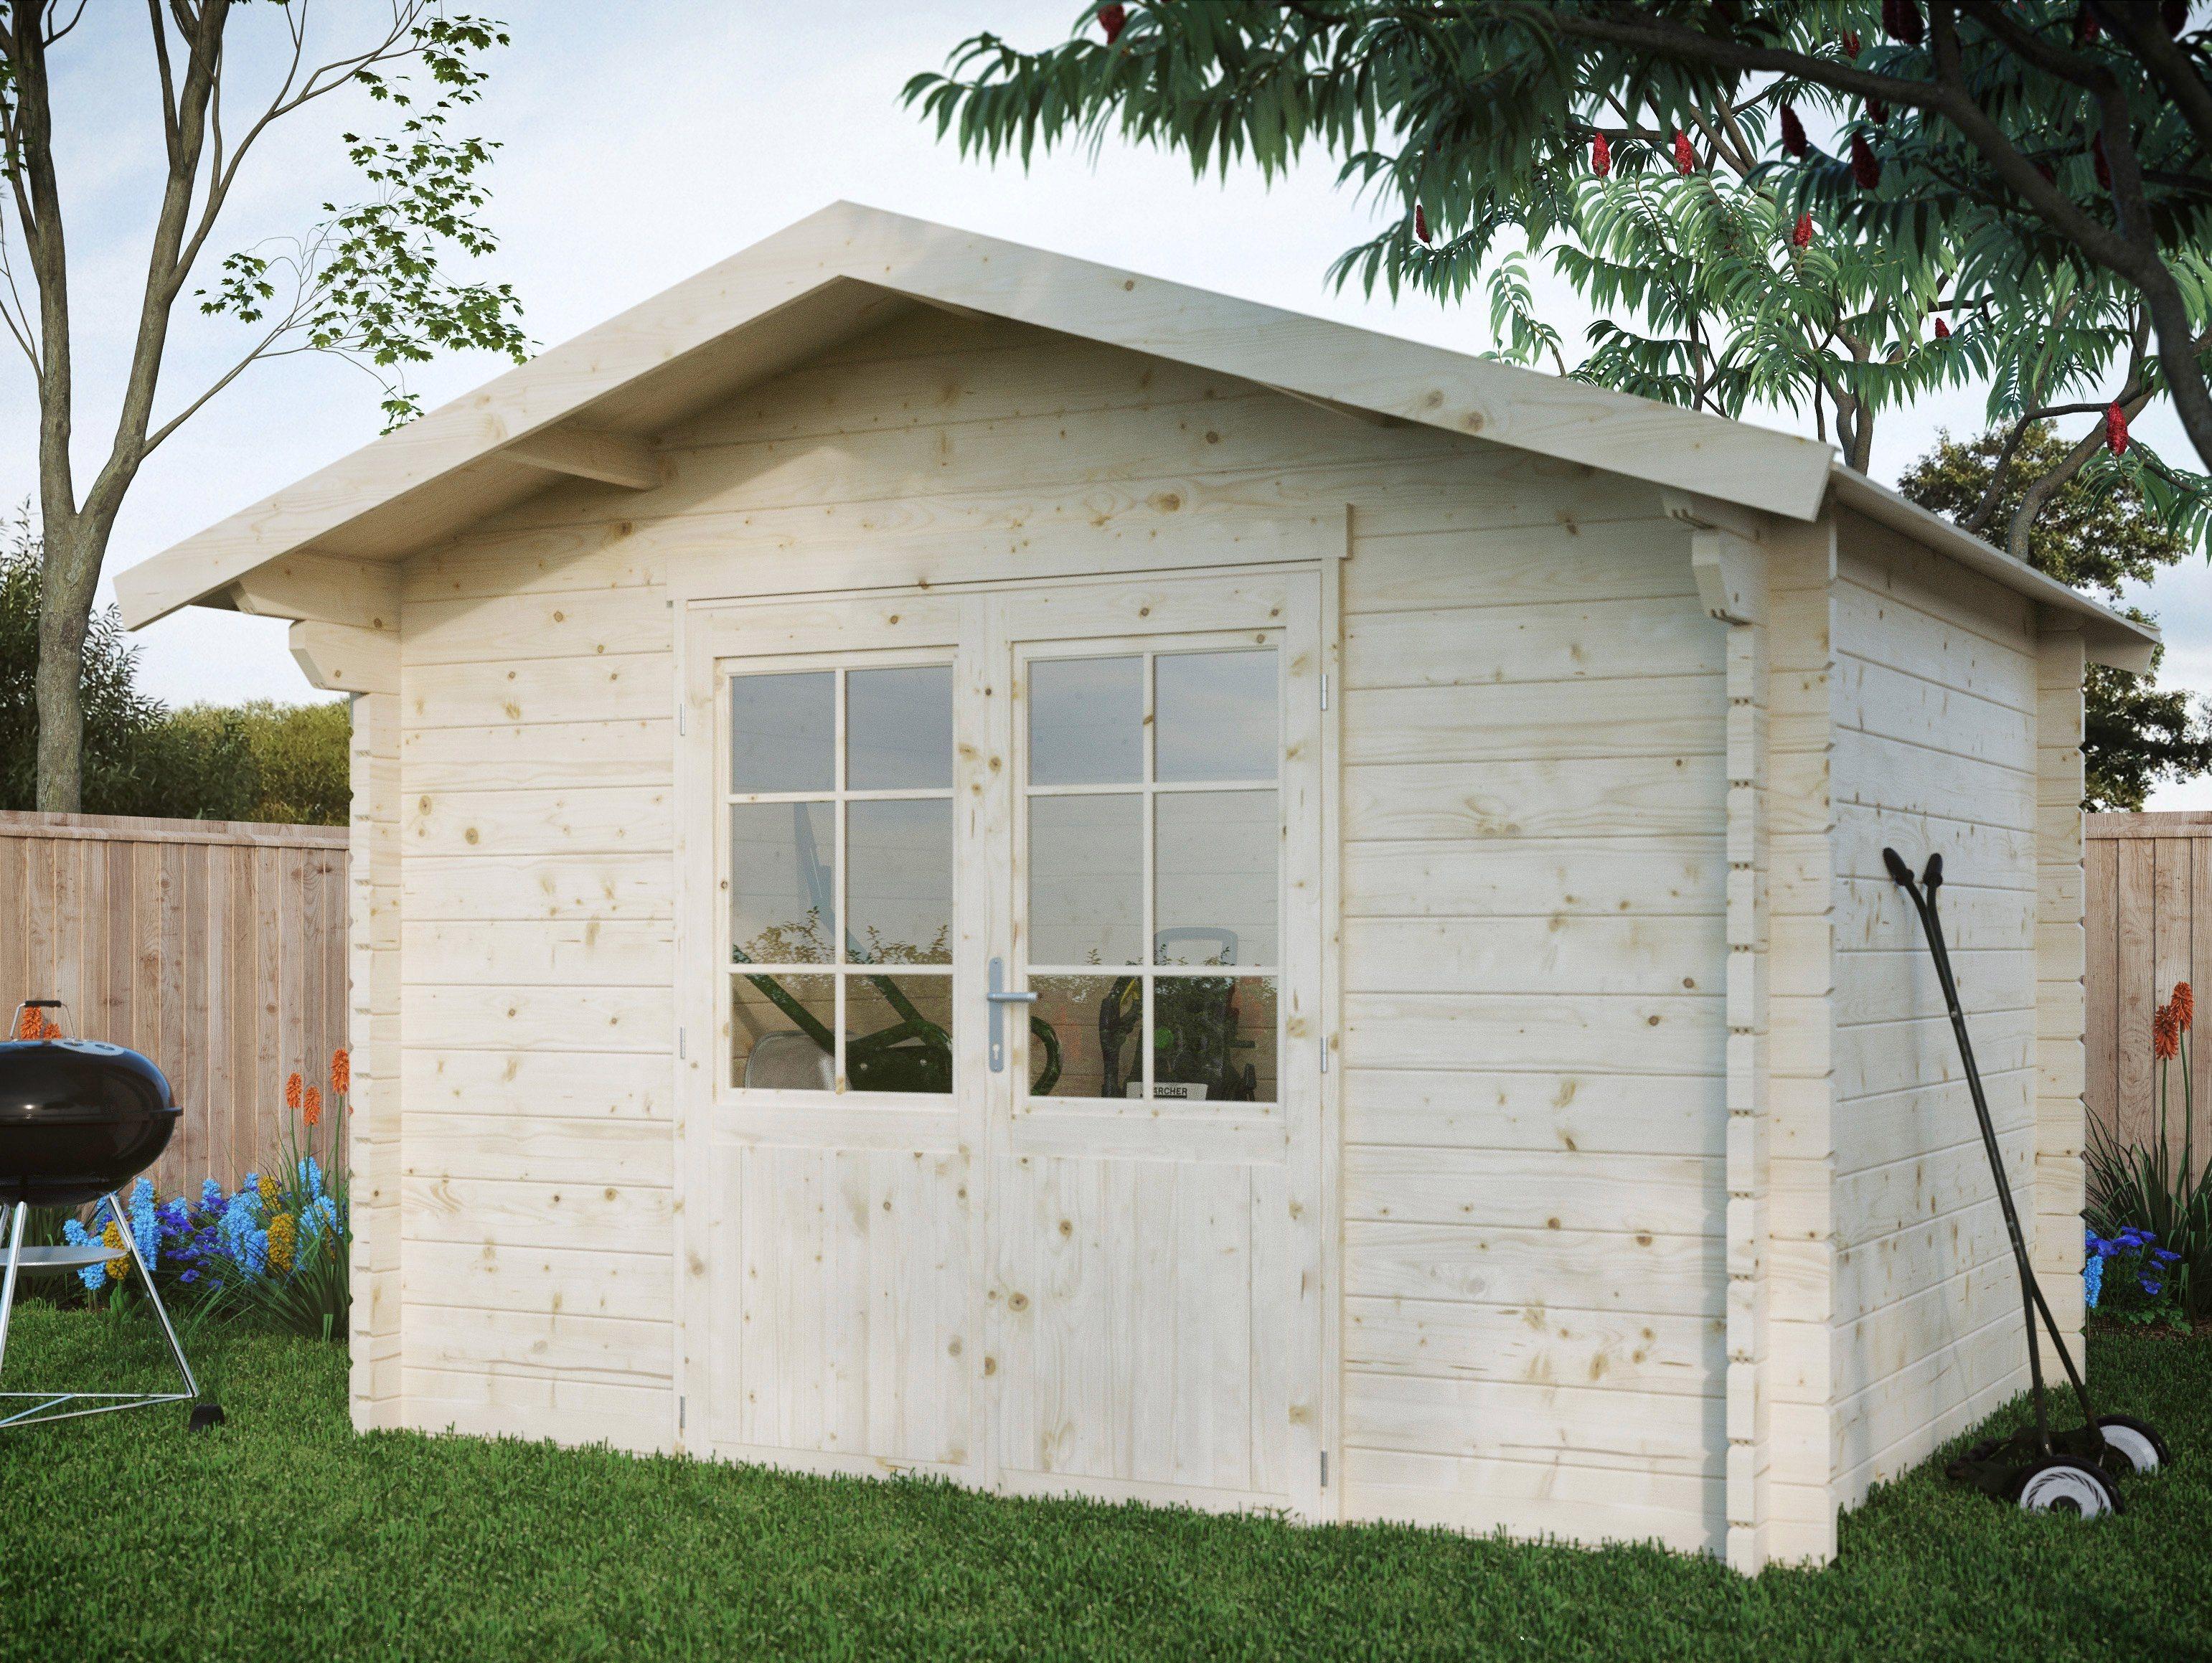 LUOMAN Gartenhaus »Kanada 1/44«, BxT: 350x296 cm, inkl. Aufbau und Fußboden, 44 mm Wandstärke | Garten > Gartenhäuser | Luoman